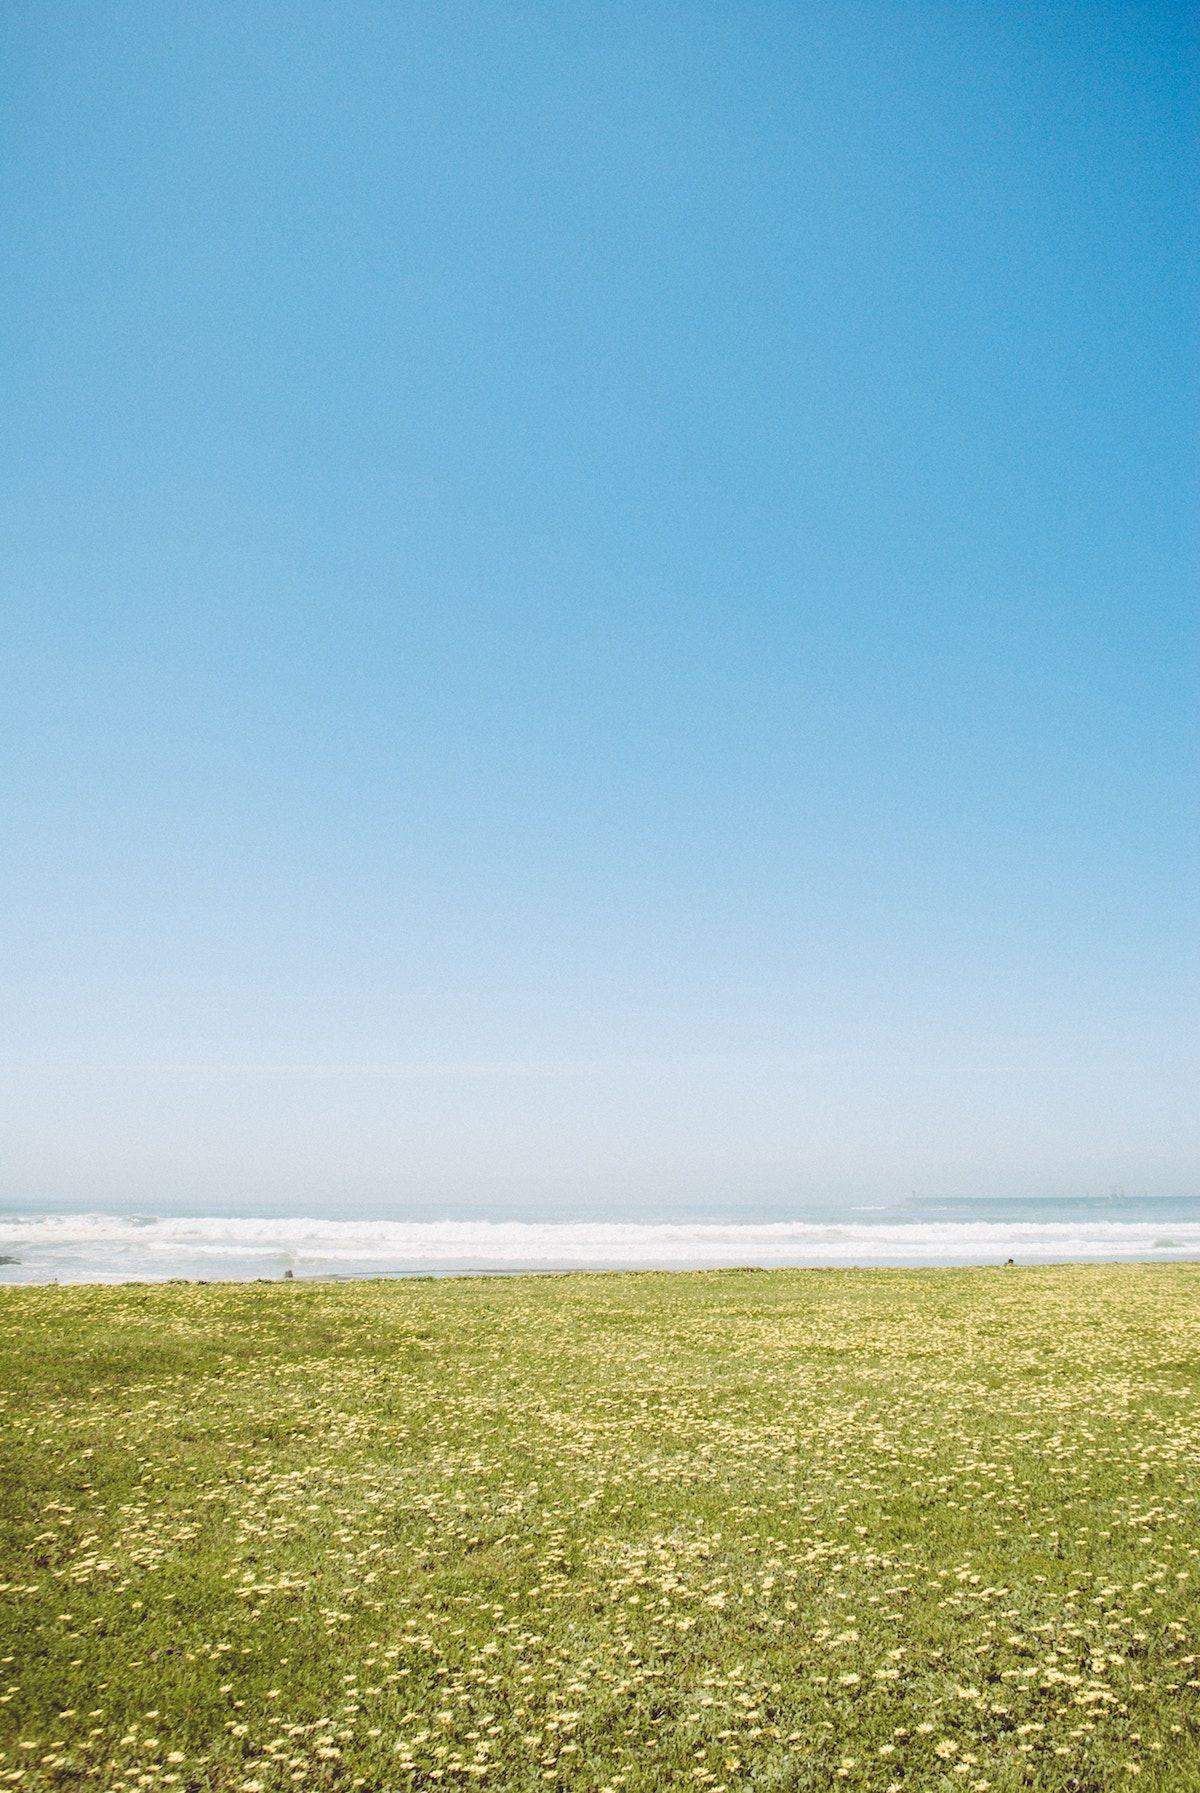 Matosinhos beach in a sunny day